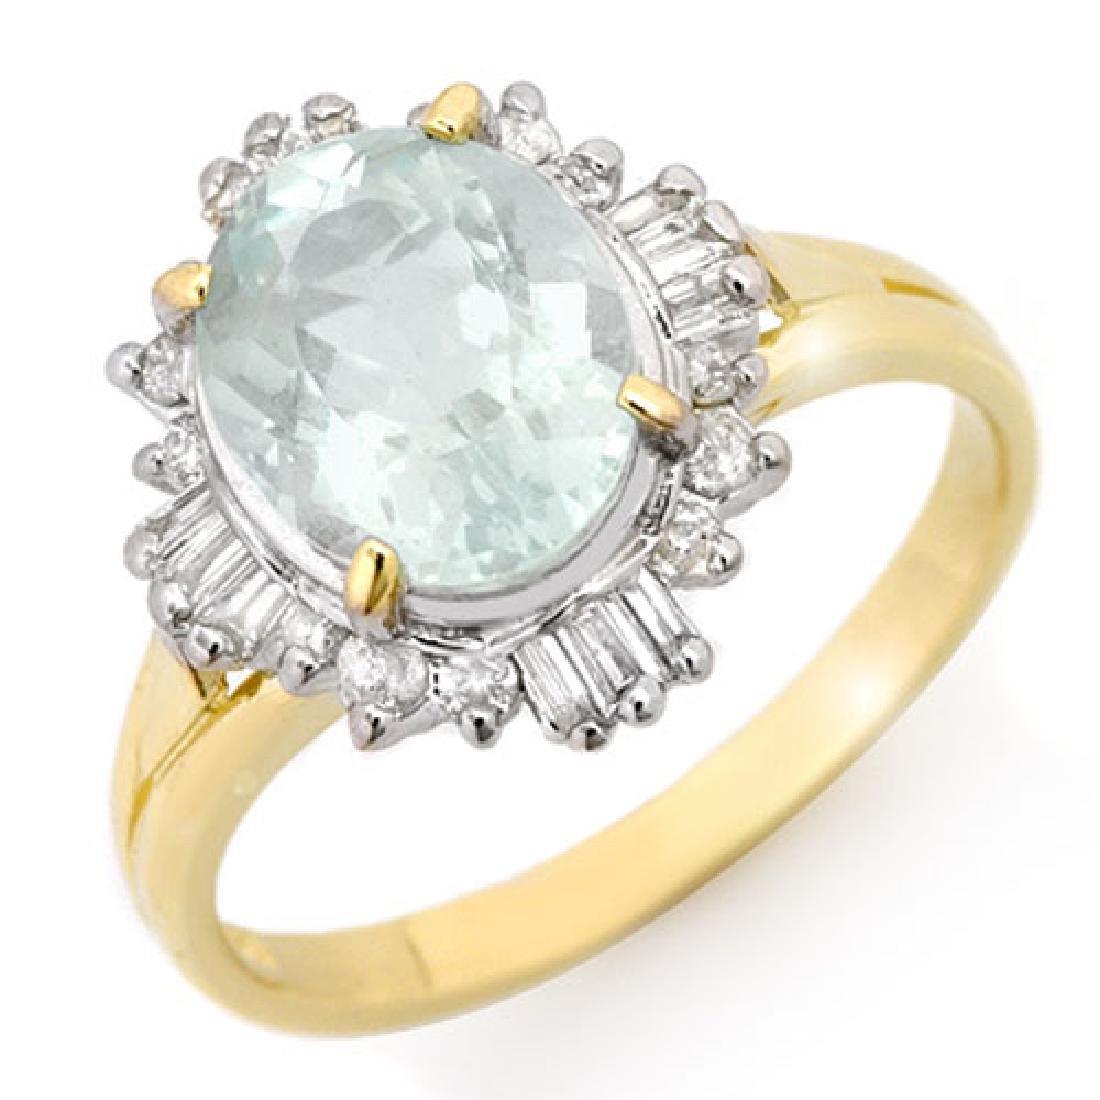 2.53 CTW Aquamarine & Diamond Ring 10K Yellow Gold